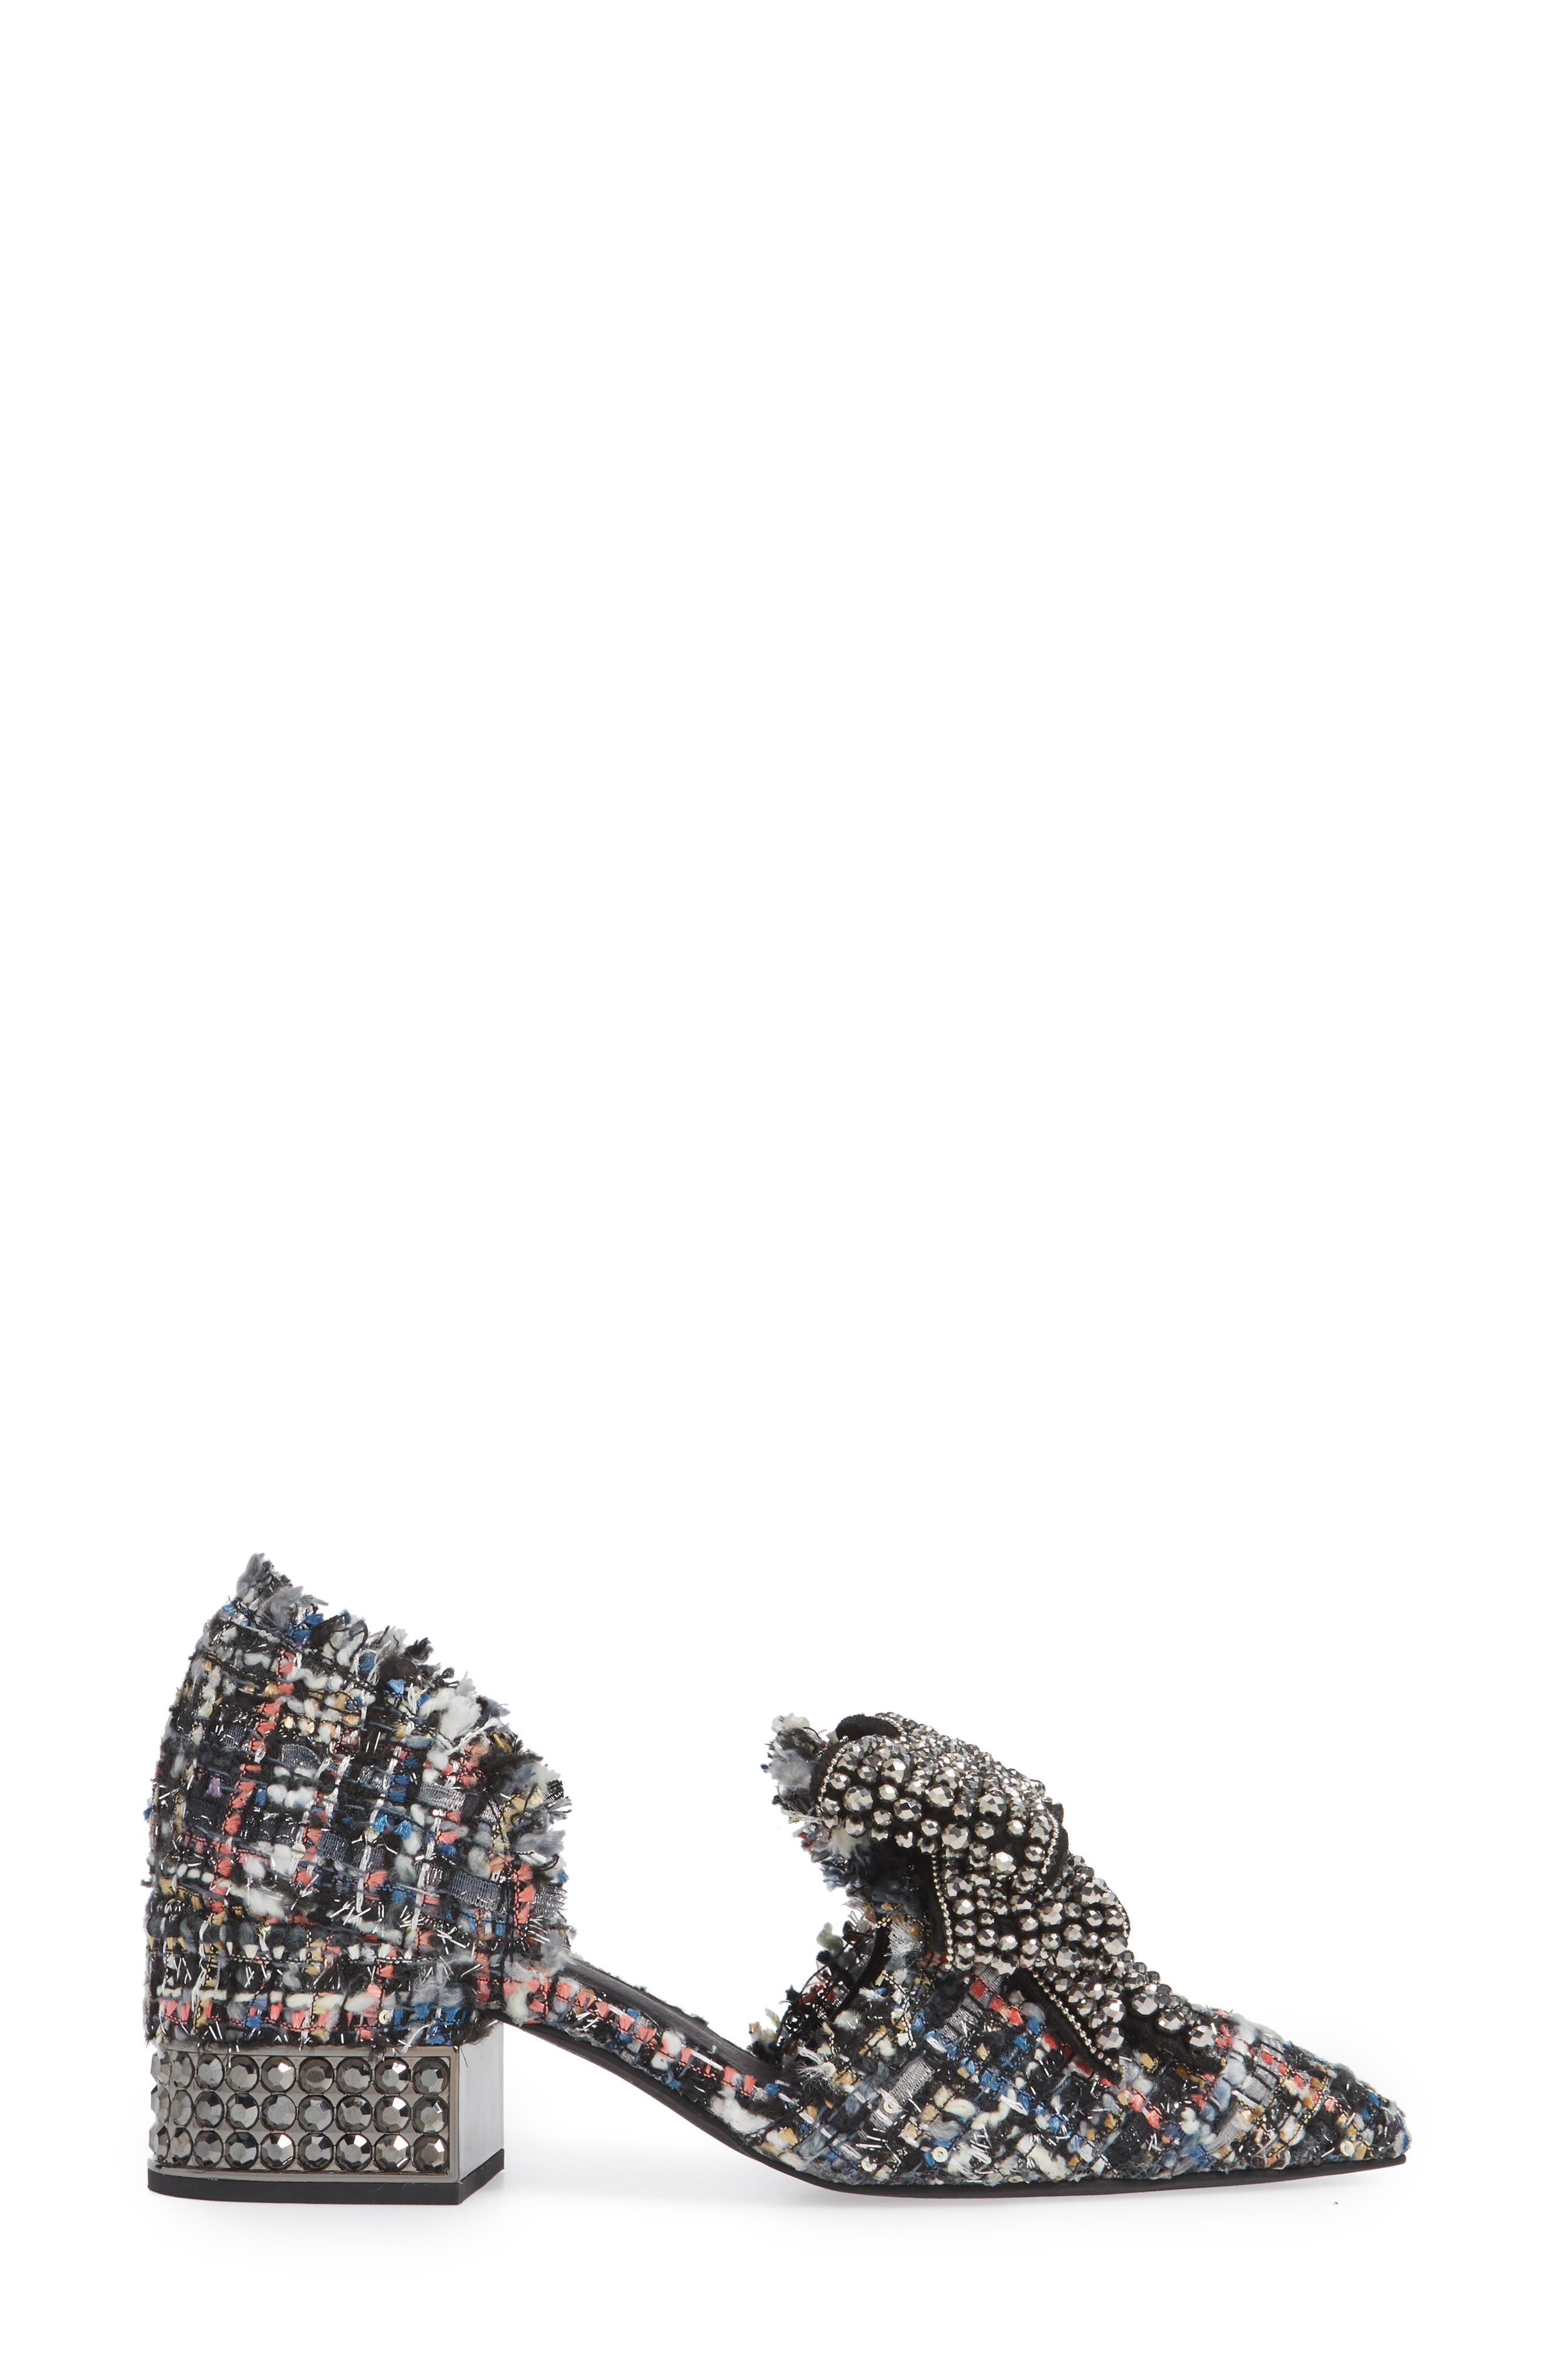 Valenti Embellished Bow Loafer,                             Alternate thumbnail 3, color,                             Black Multi Tweed Pewter